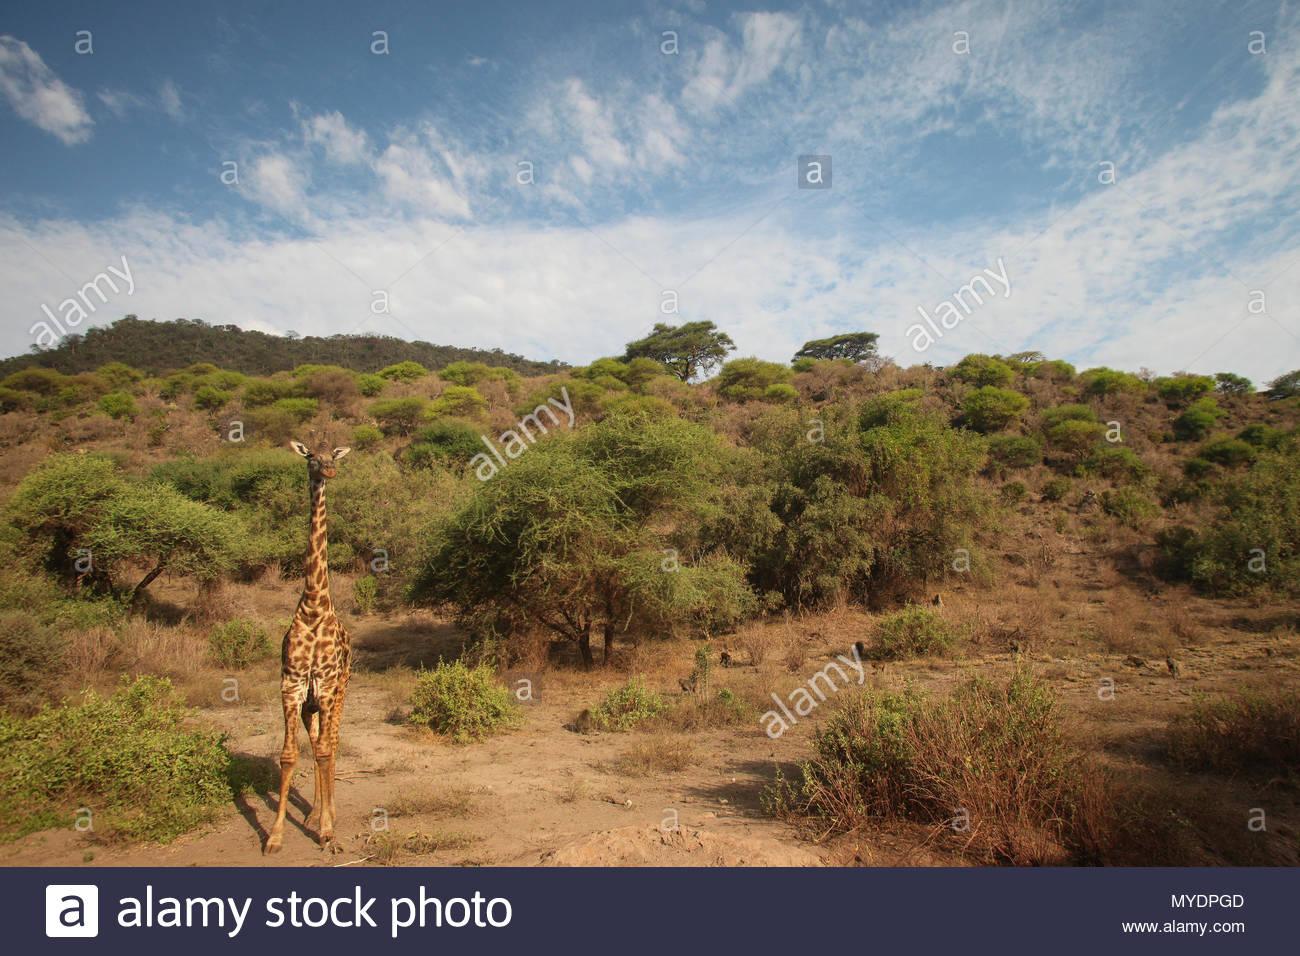 Masai UNE Girafe (Giraffa camelopardalis) tippelskirchii. Photo Stock